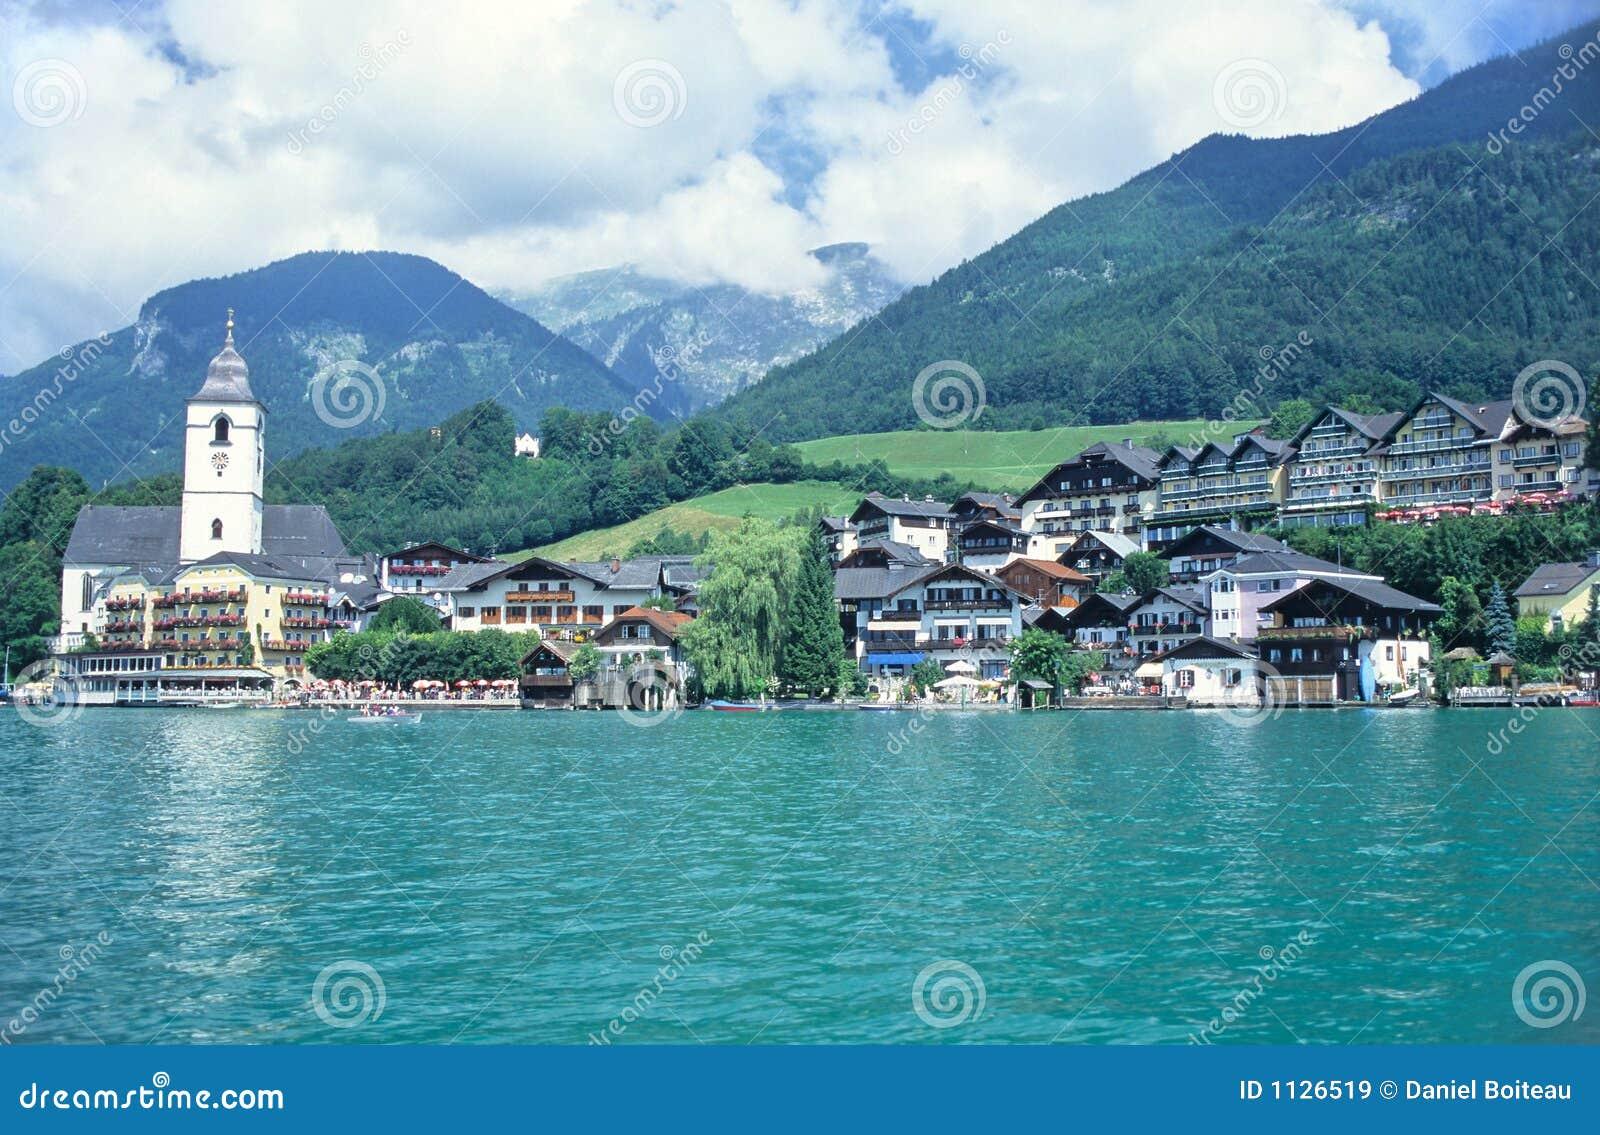 Download Austrian village stock image. Image of europe, mountain - 1126519